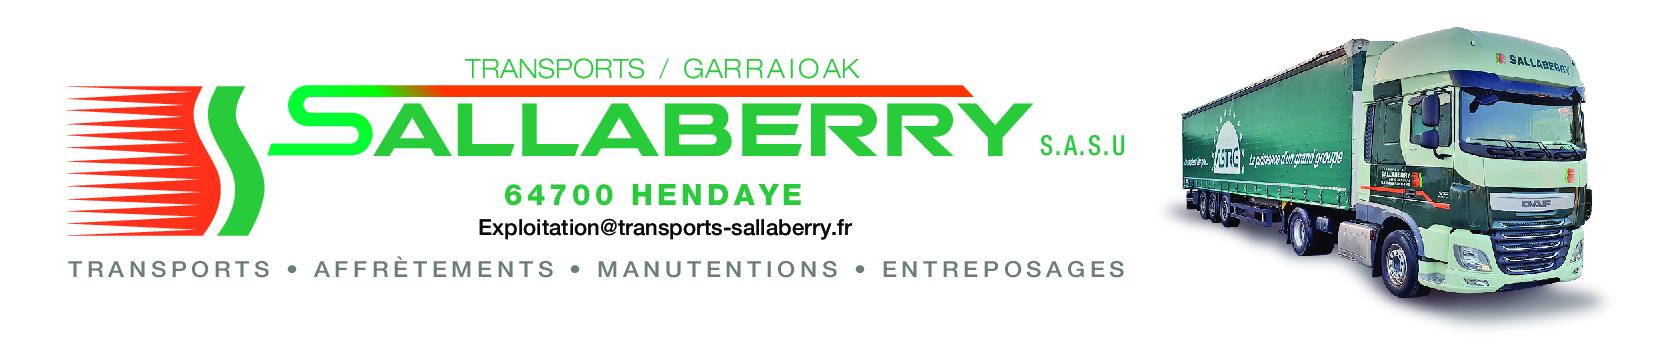 Transports Sallaberry